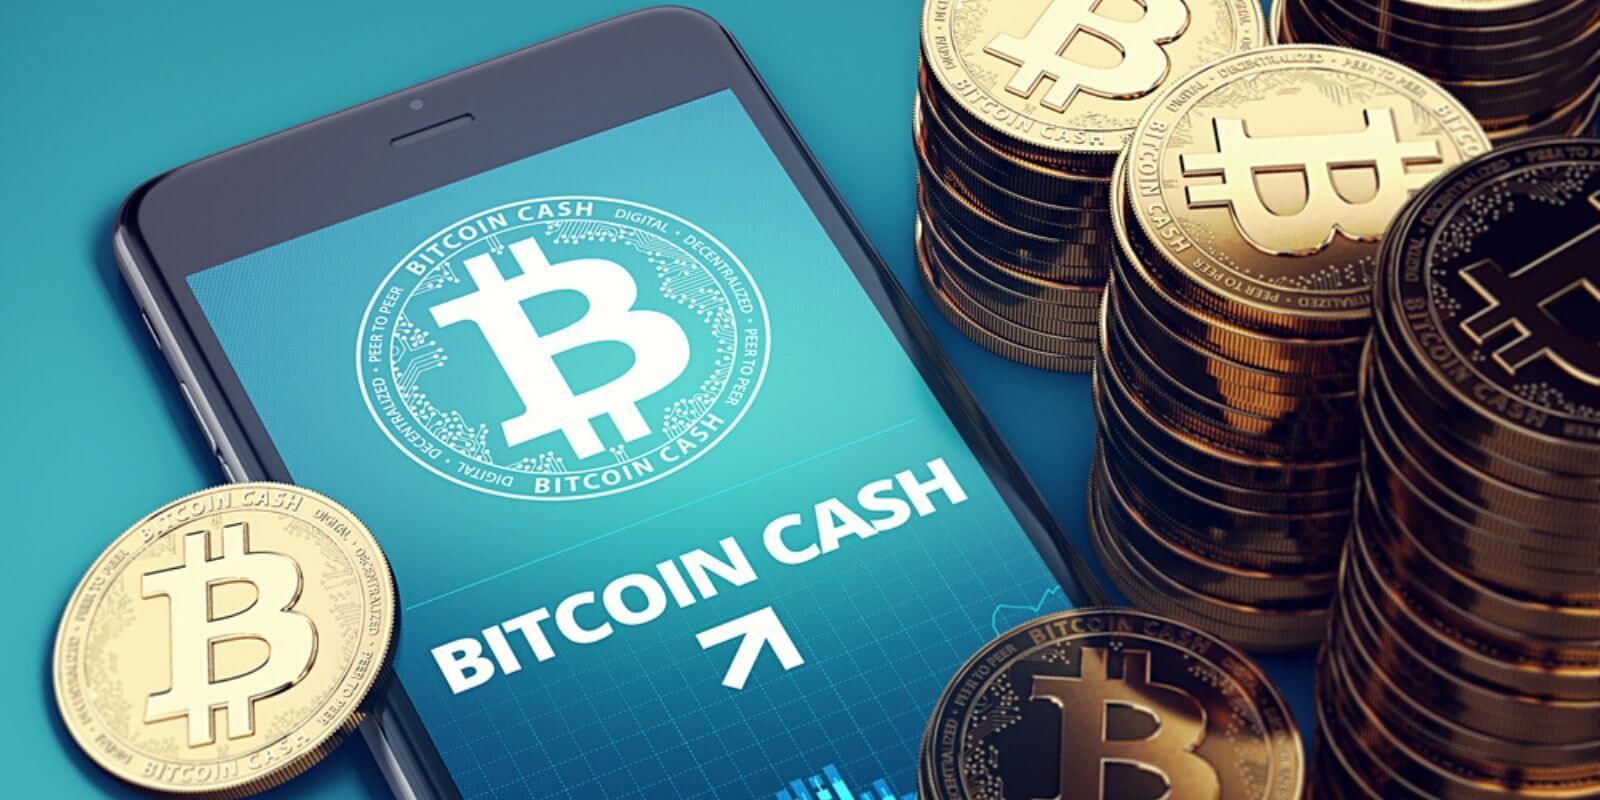 Bitcoin Cash avis : un bon plan ou une arnaque ?